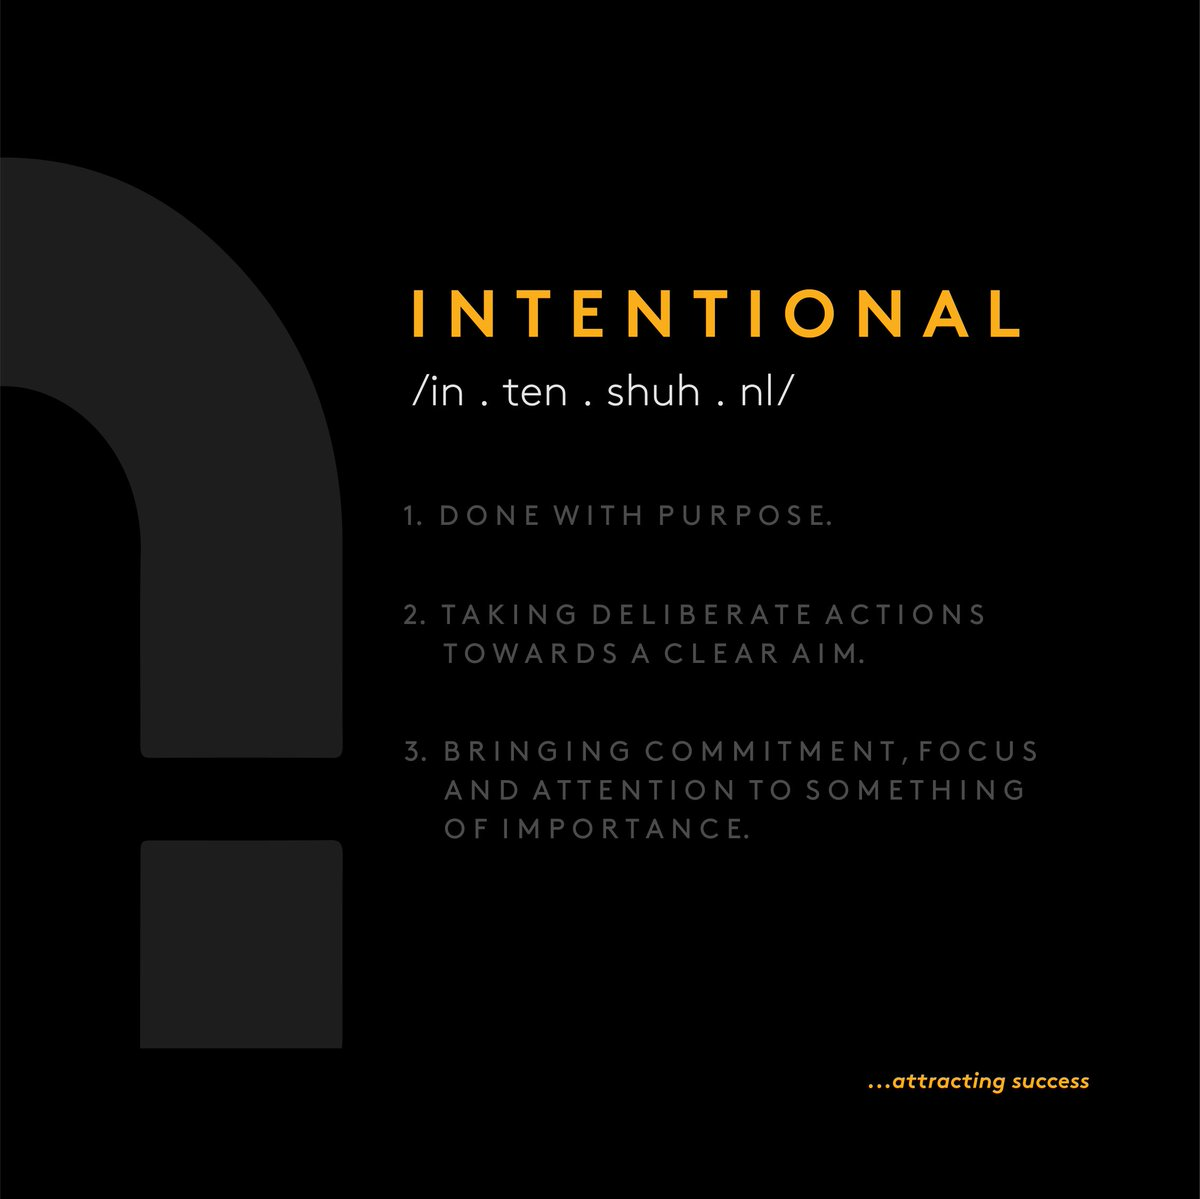 Where intention goes, energy flows⚡ #mondaythoughts #MondayMotivation #startup #entrepreneurs #businessowner #success